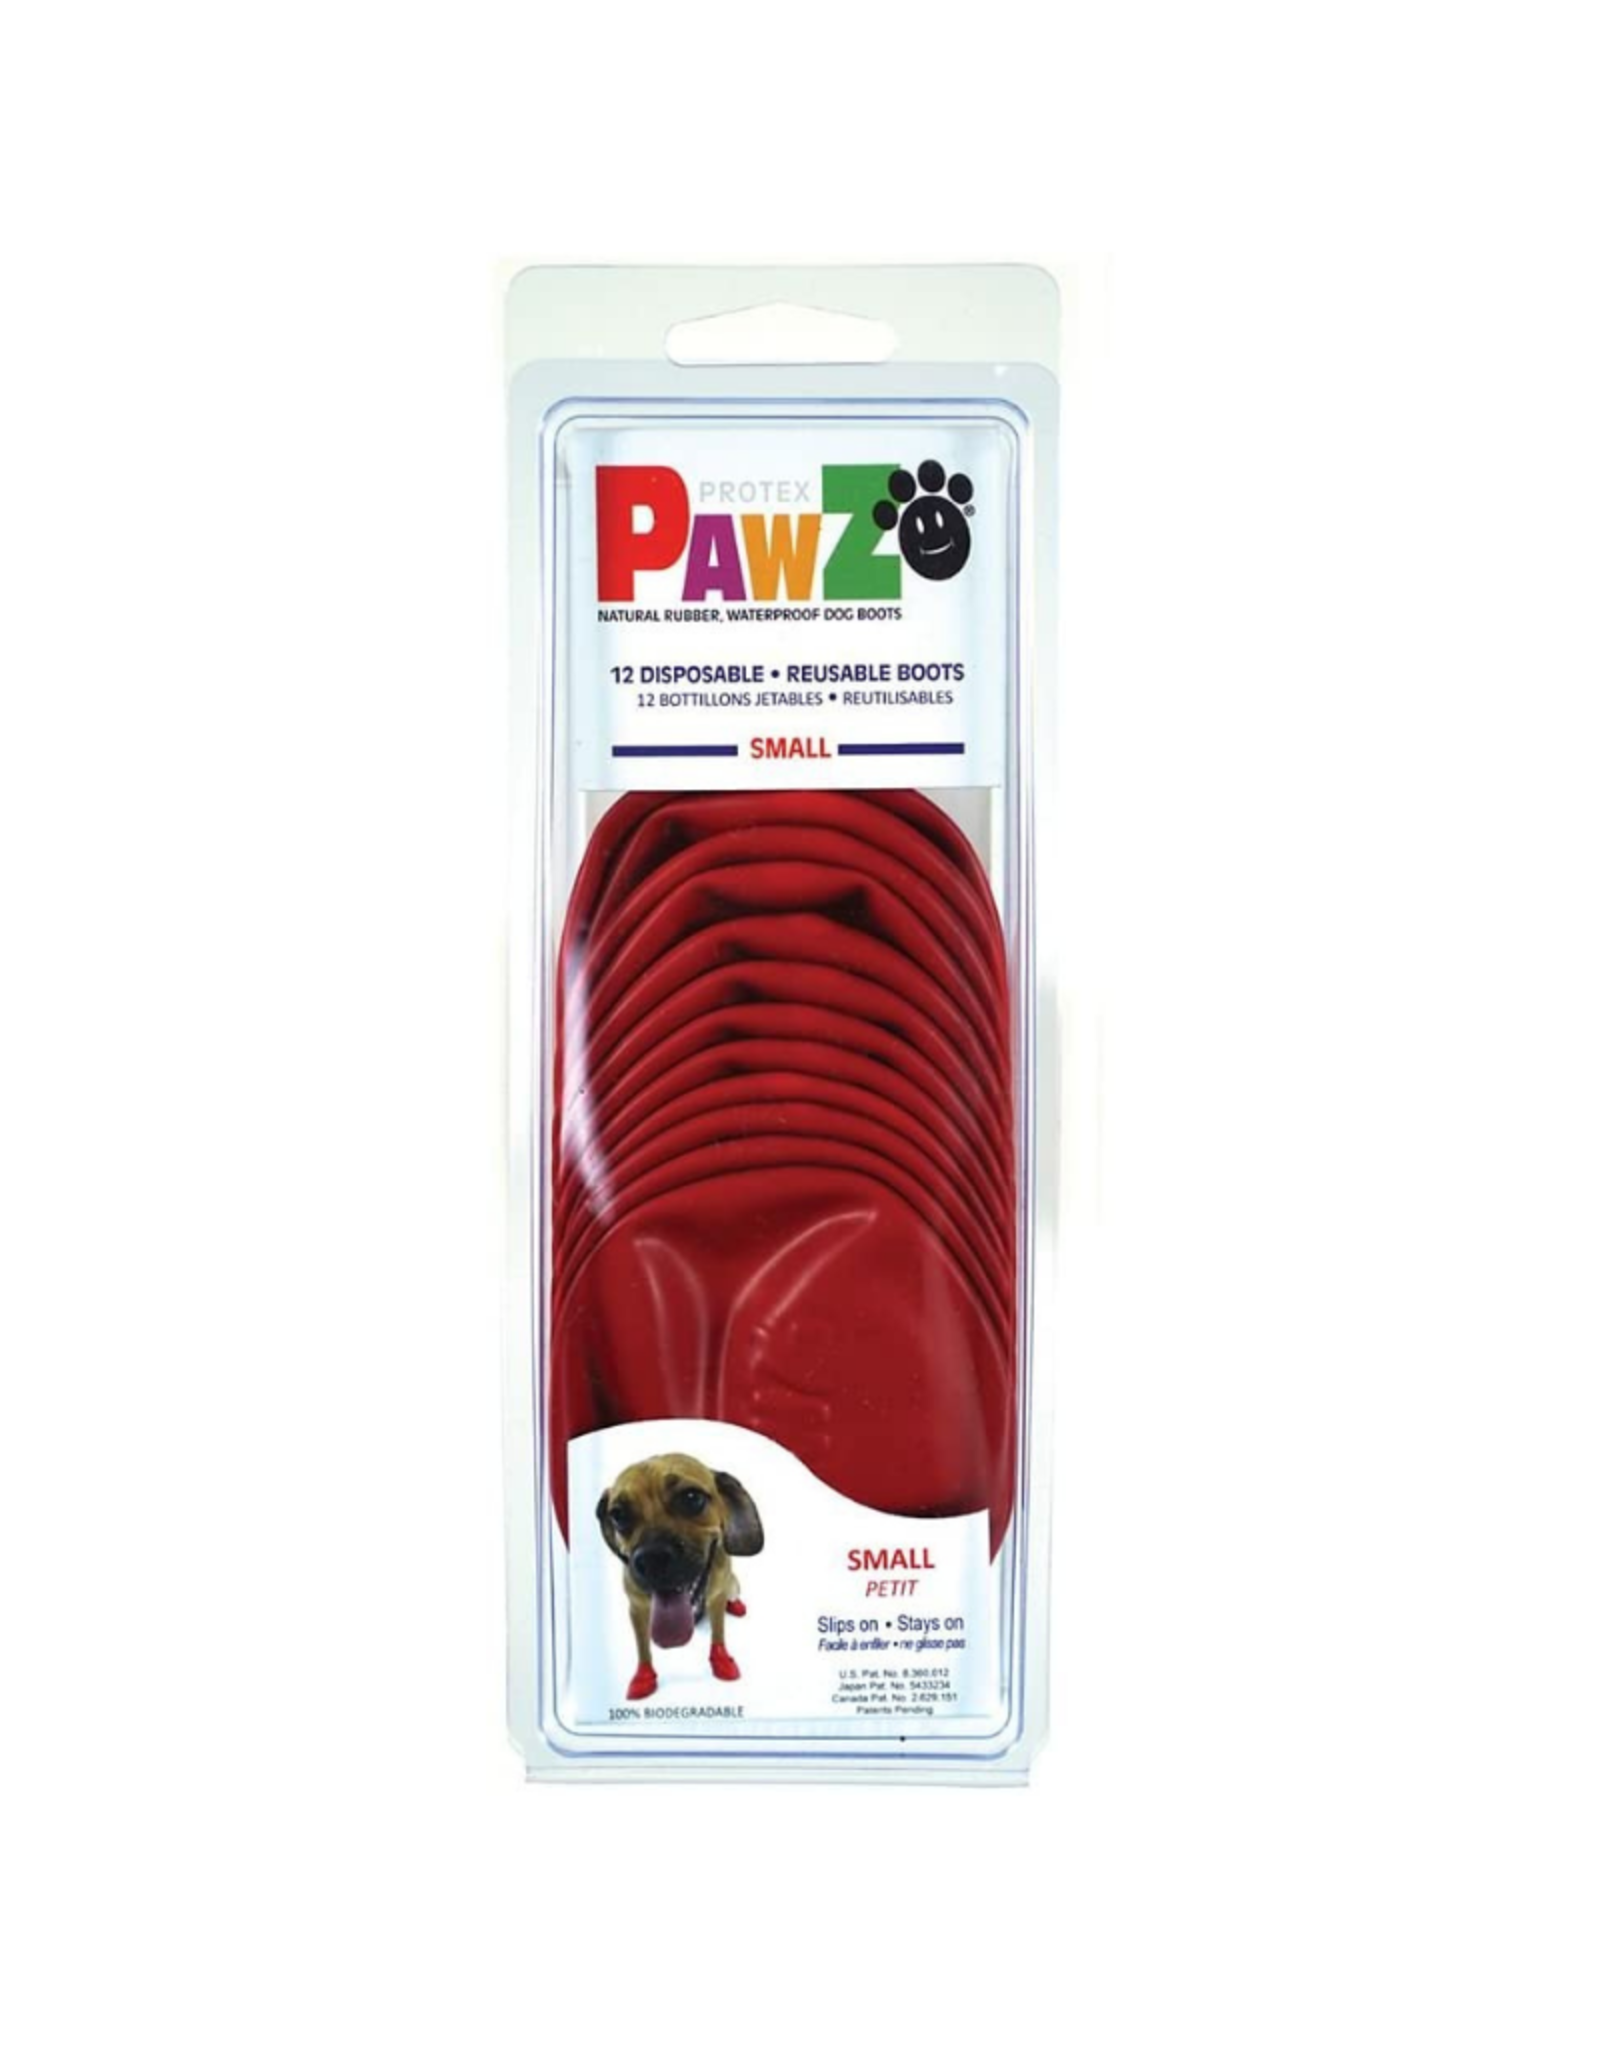 PAWZ Natural Rubber Waterproof Dog Boots